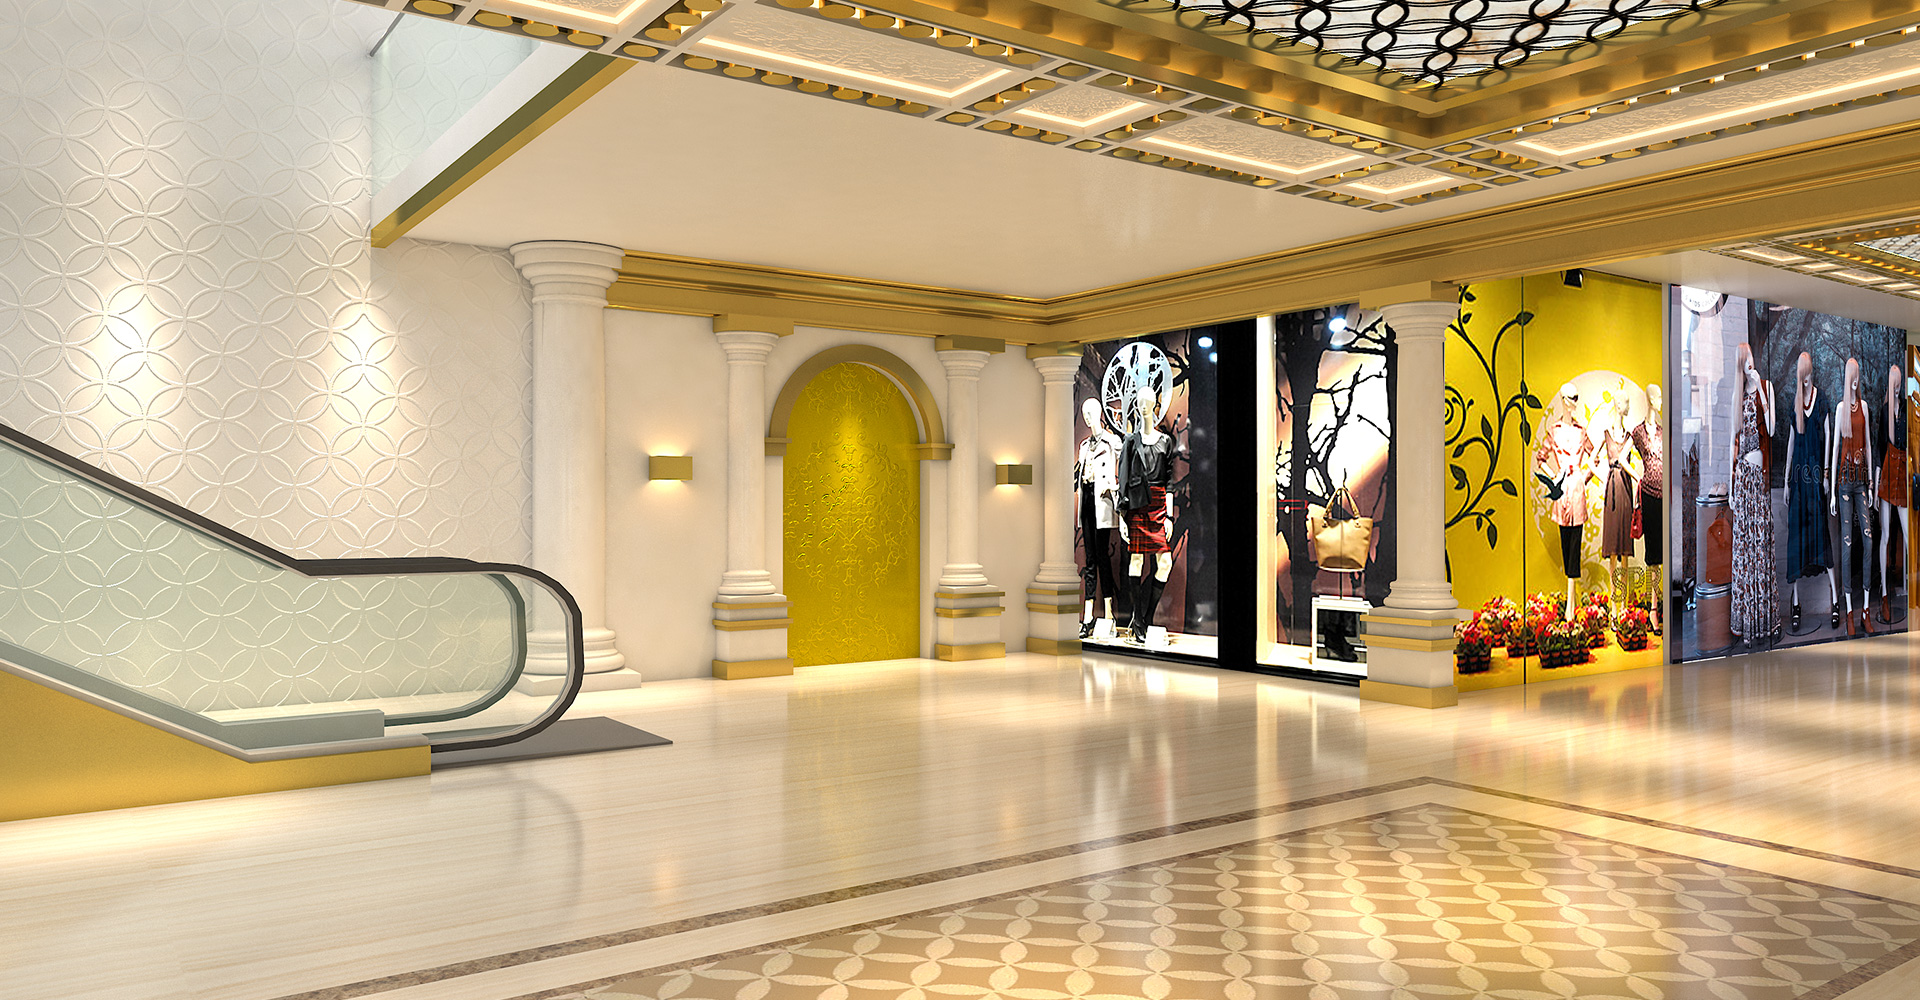 Building-Design-Hiline-Lahore-portfolio-Orchard-Mall-06